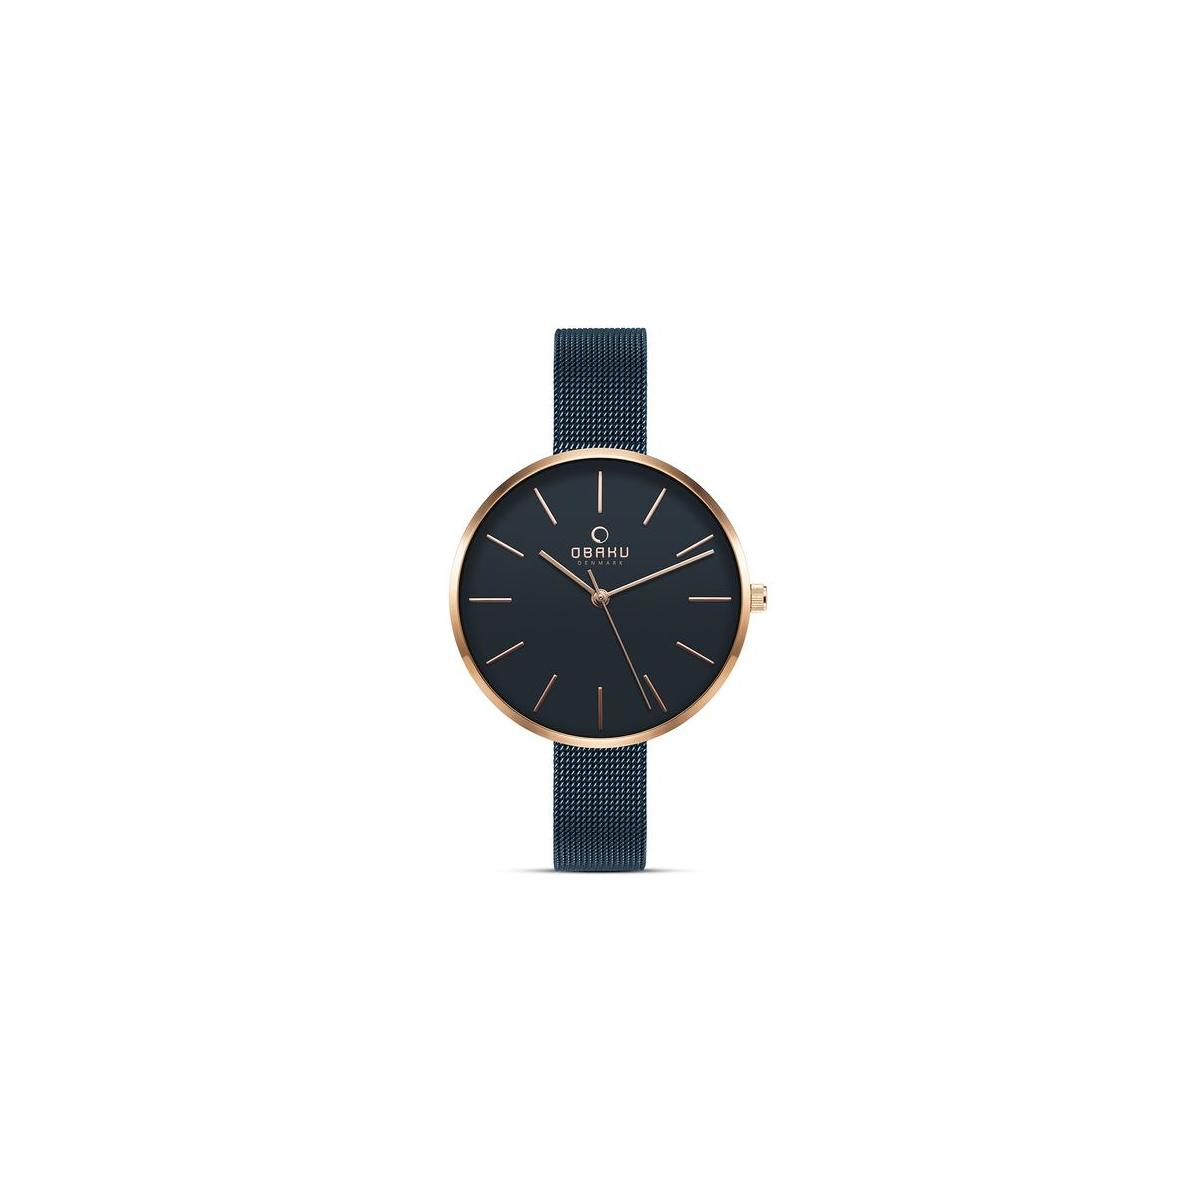 Obaku Denmark - Womens Designer Watch - Classic Yet Modern Design Elegant Rose Gold Steel Case - Mesh Band - Model: Mynte (Sapphire Blue)